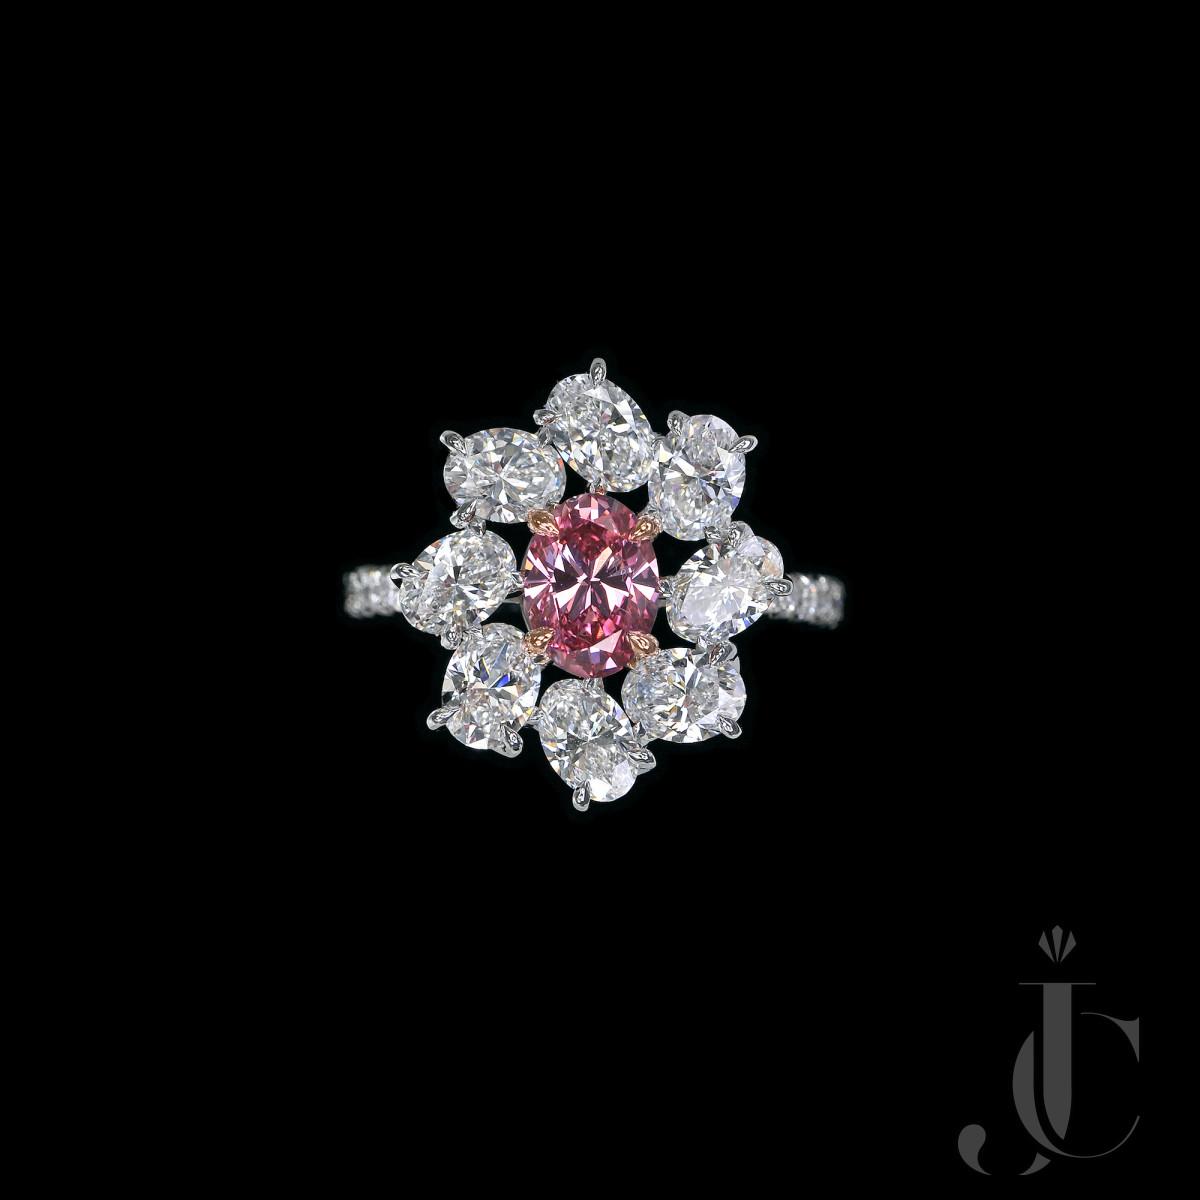 Fancy Vivid Argyle Pink Diamond Ring, GIA report & Argyle certificate available